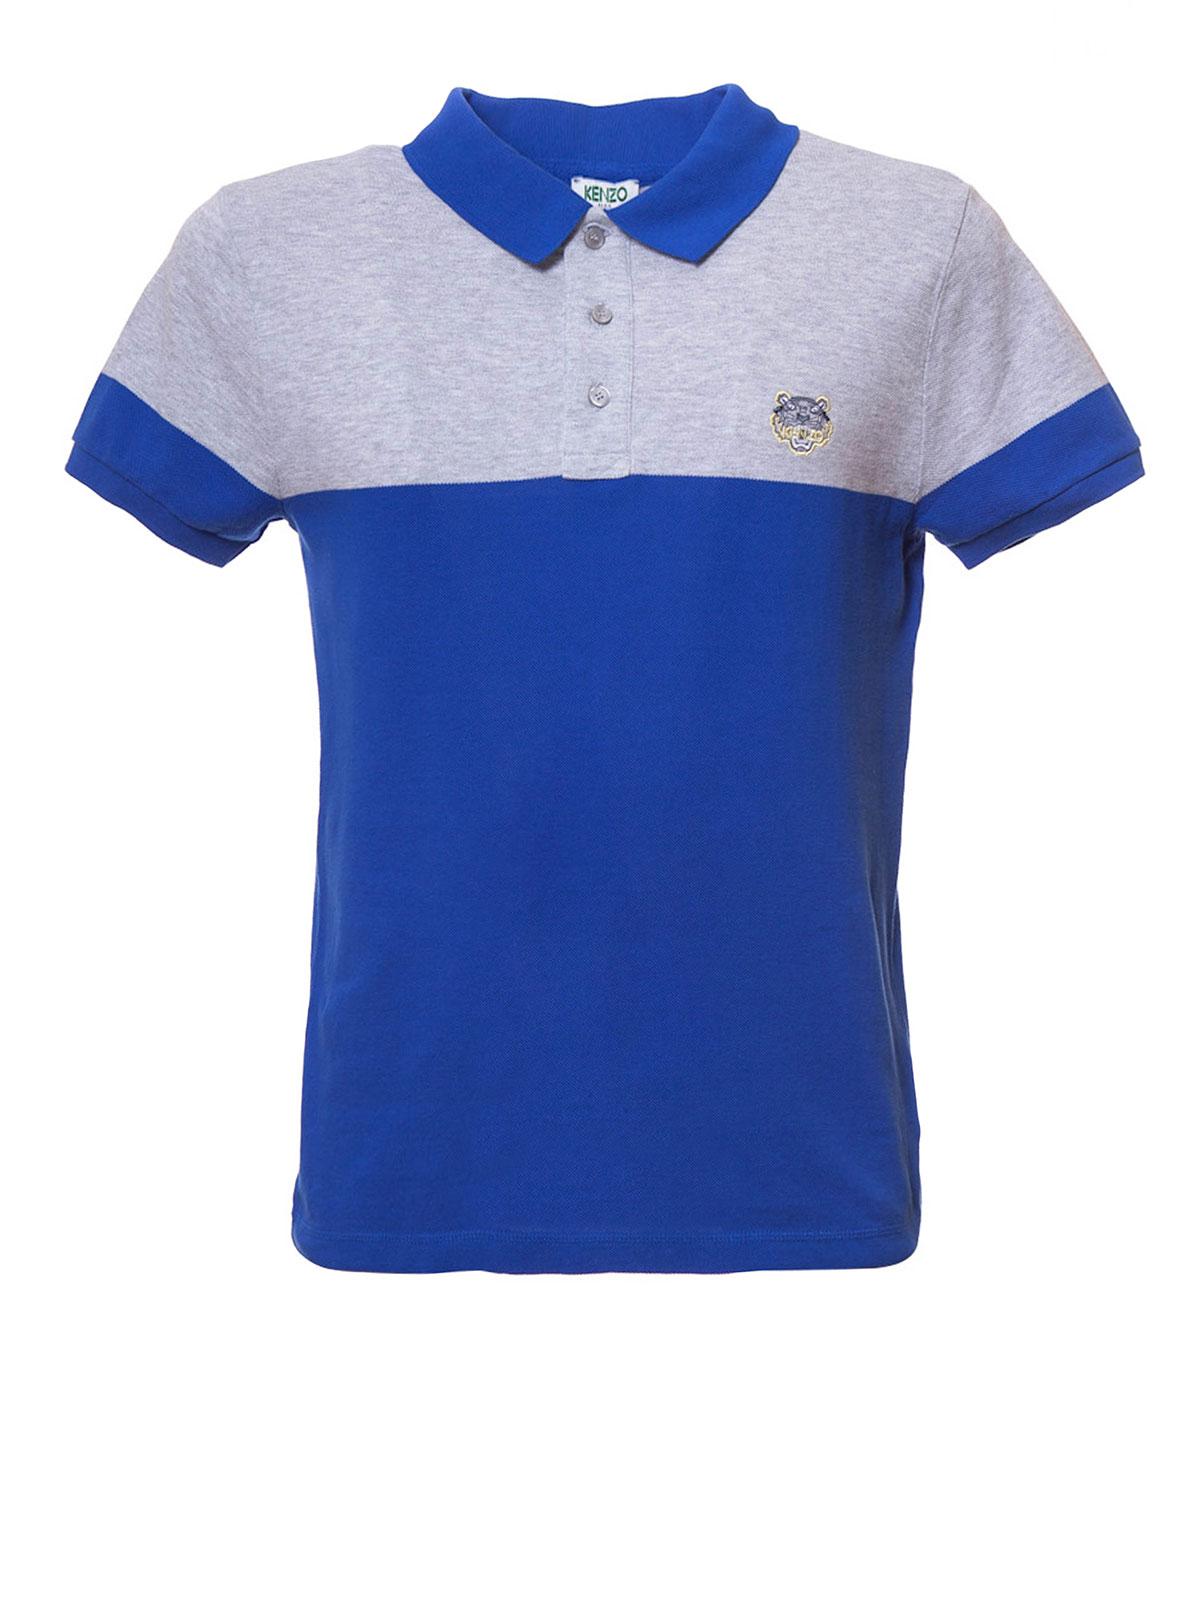 Kenzo Two Tone Tiger Polo Shirt Polo Shirts